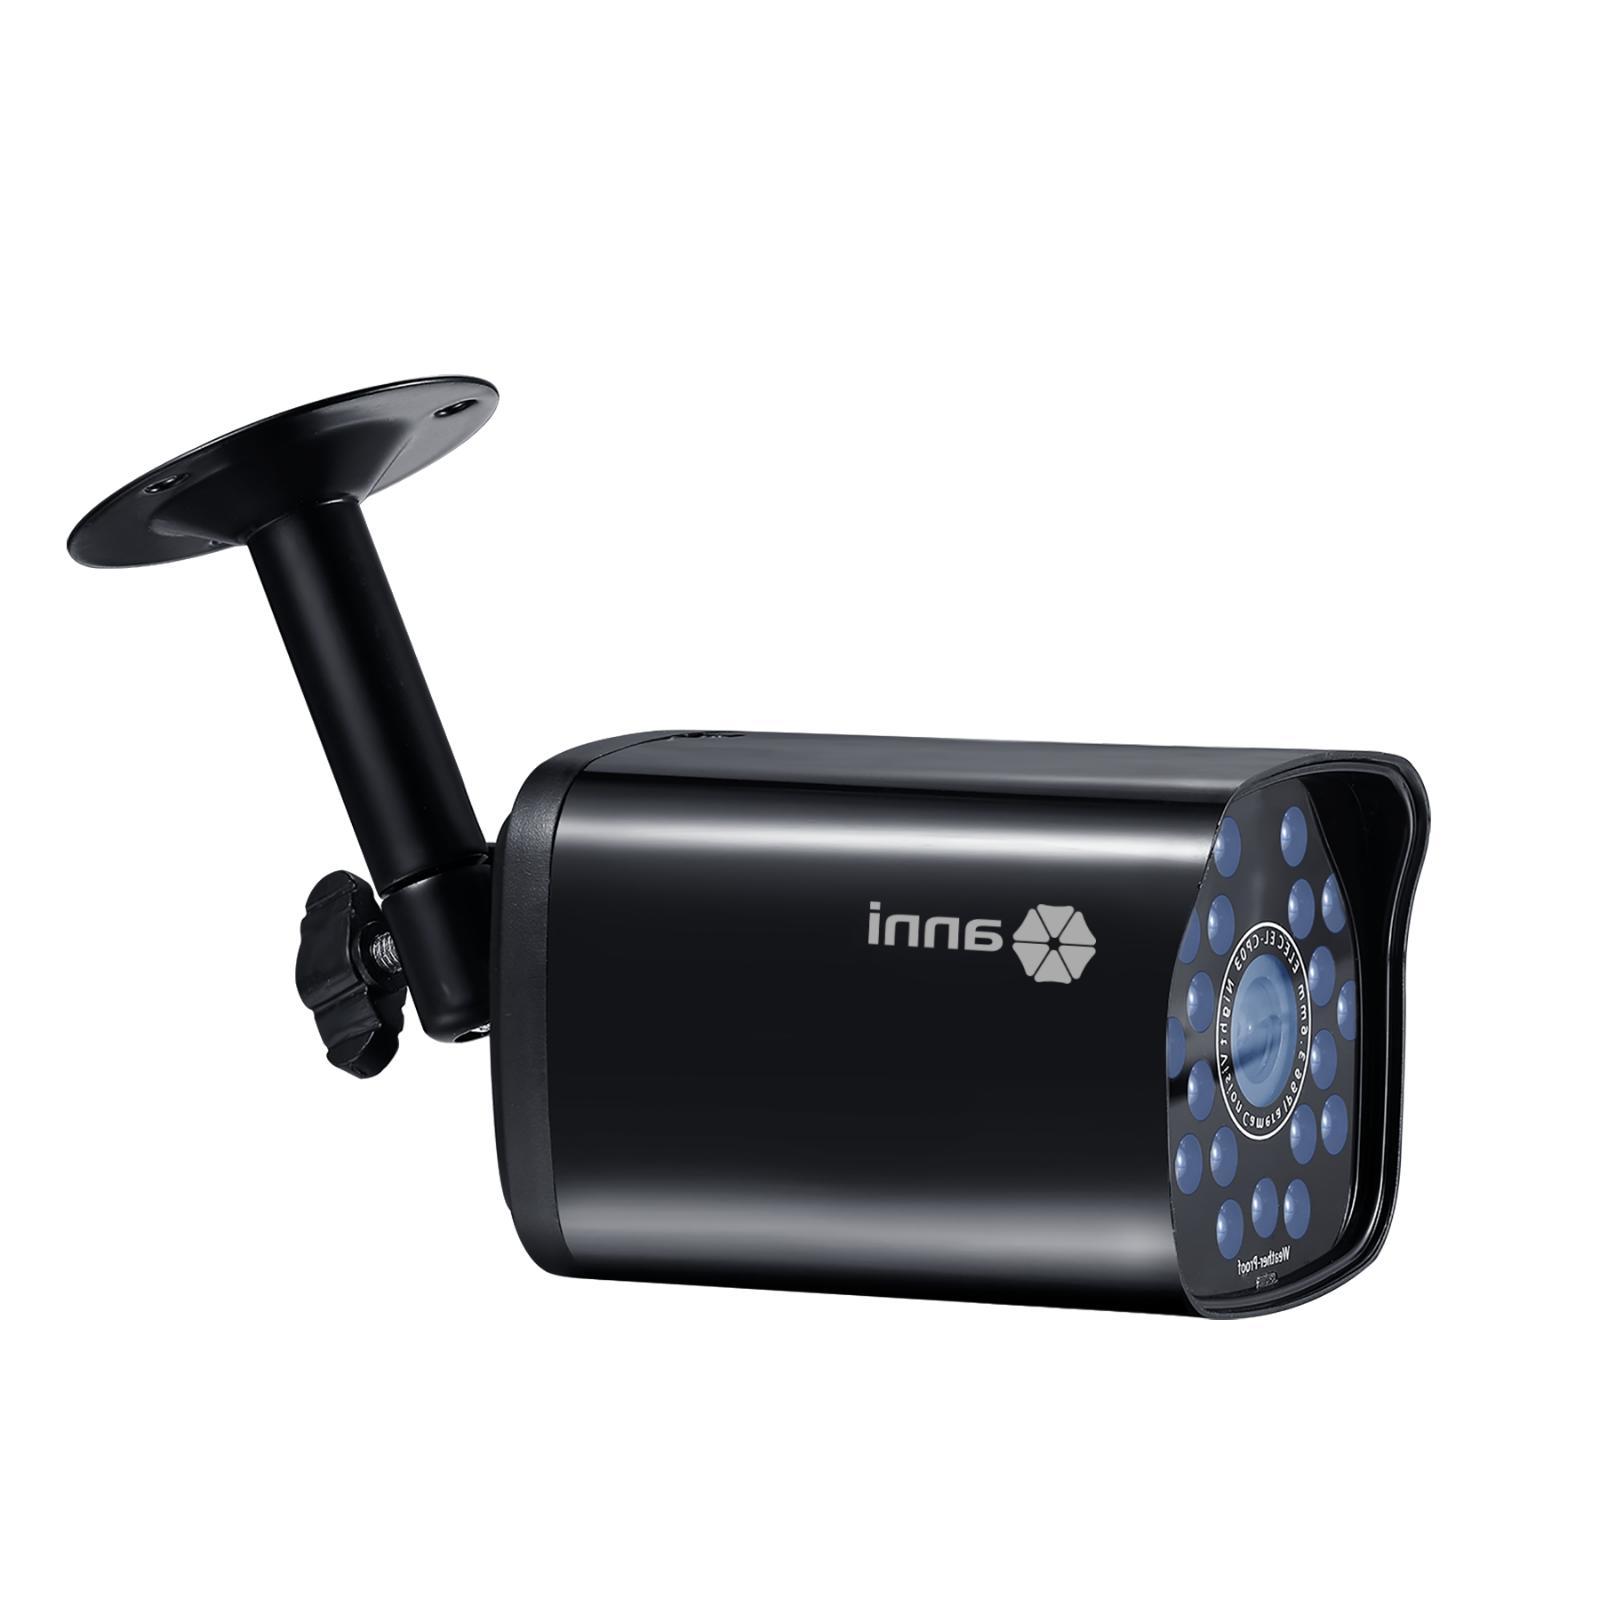 bullet 1500tvl cctv camera 720p tvi ir